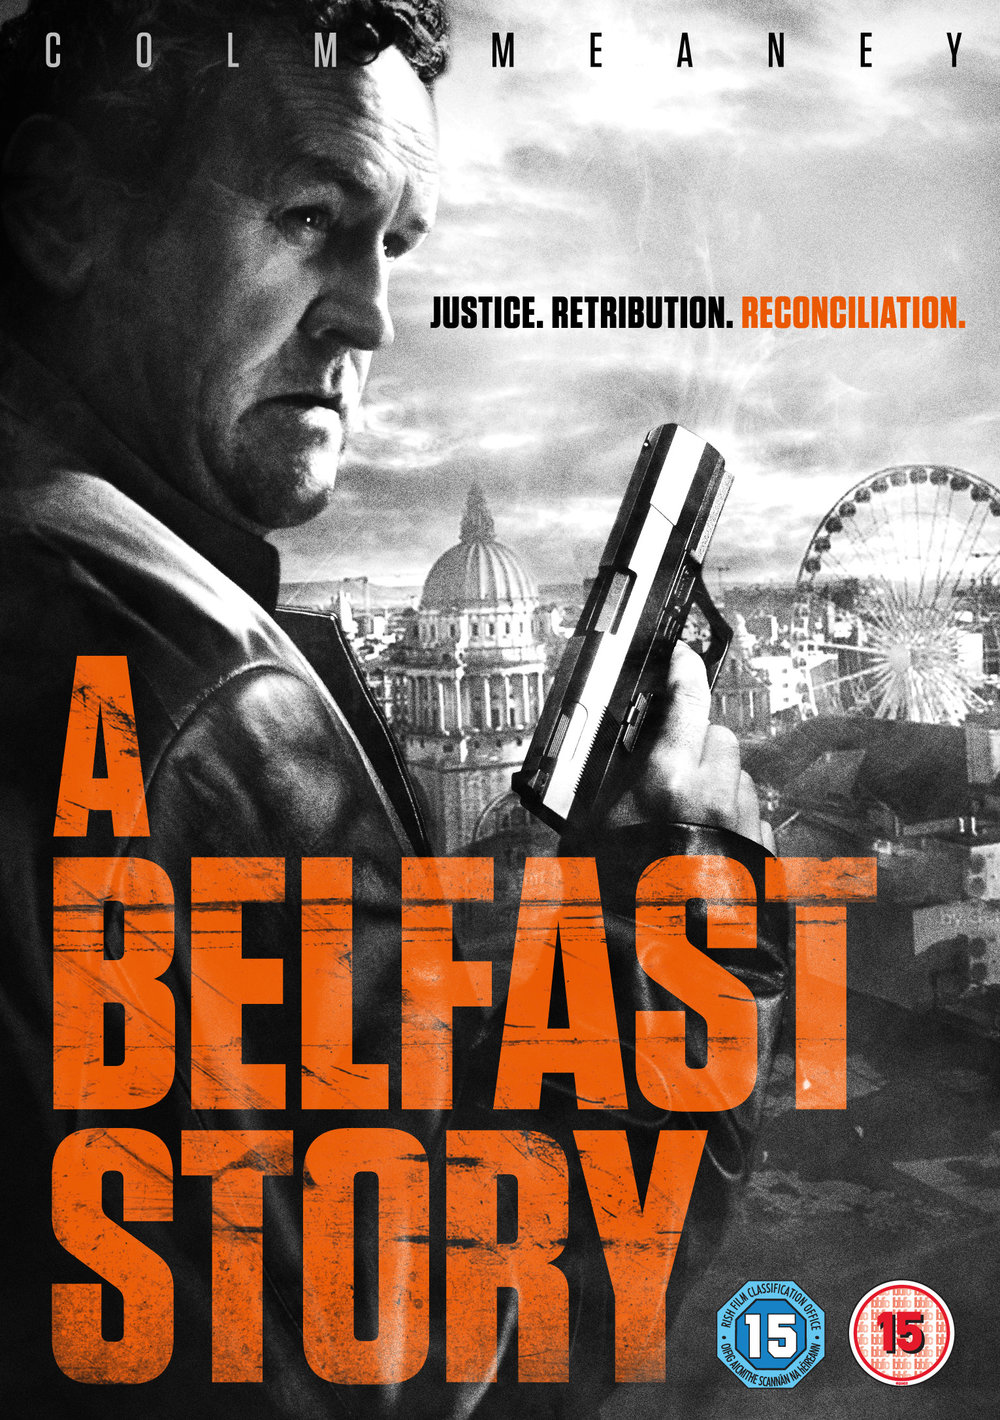 A_Belfast_Story_DVD_Dev3-2.jpg